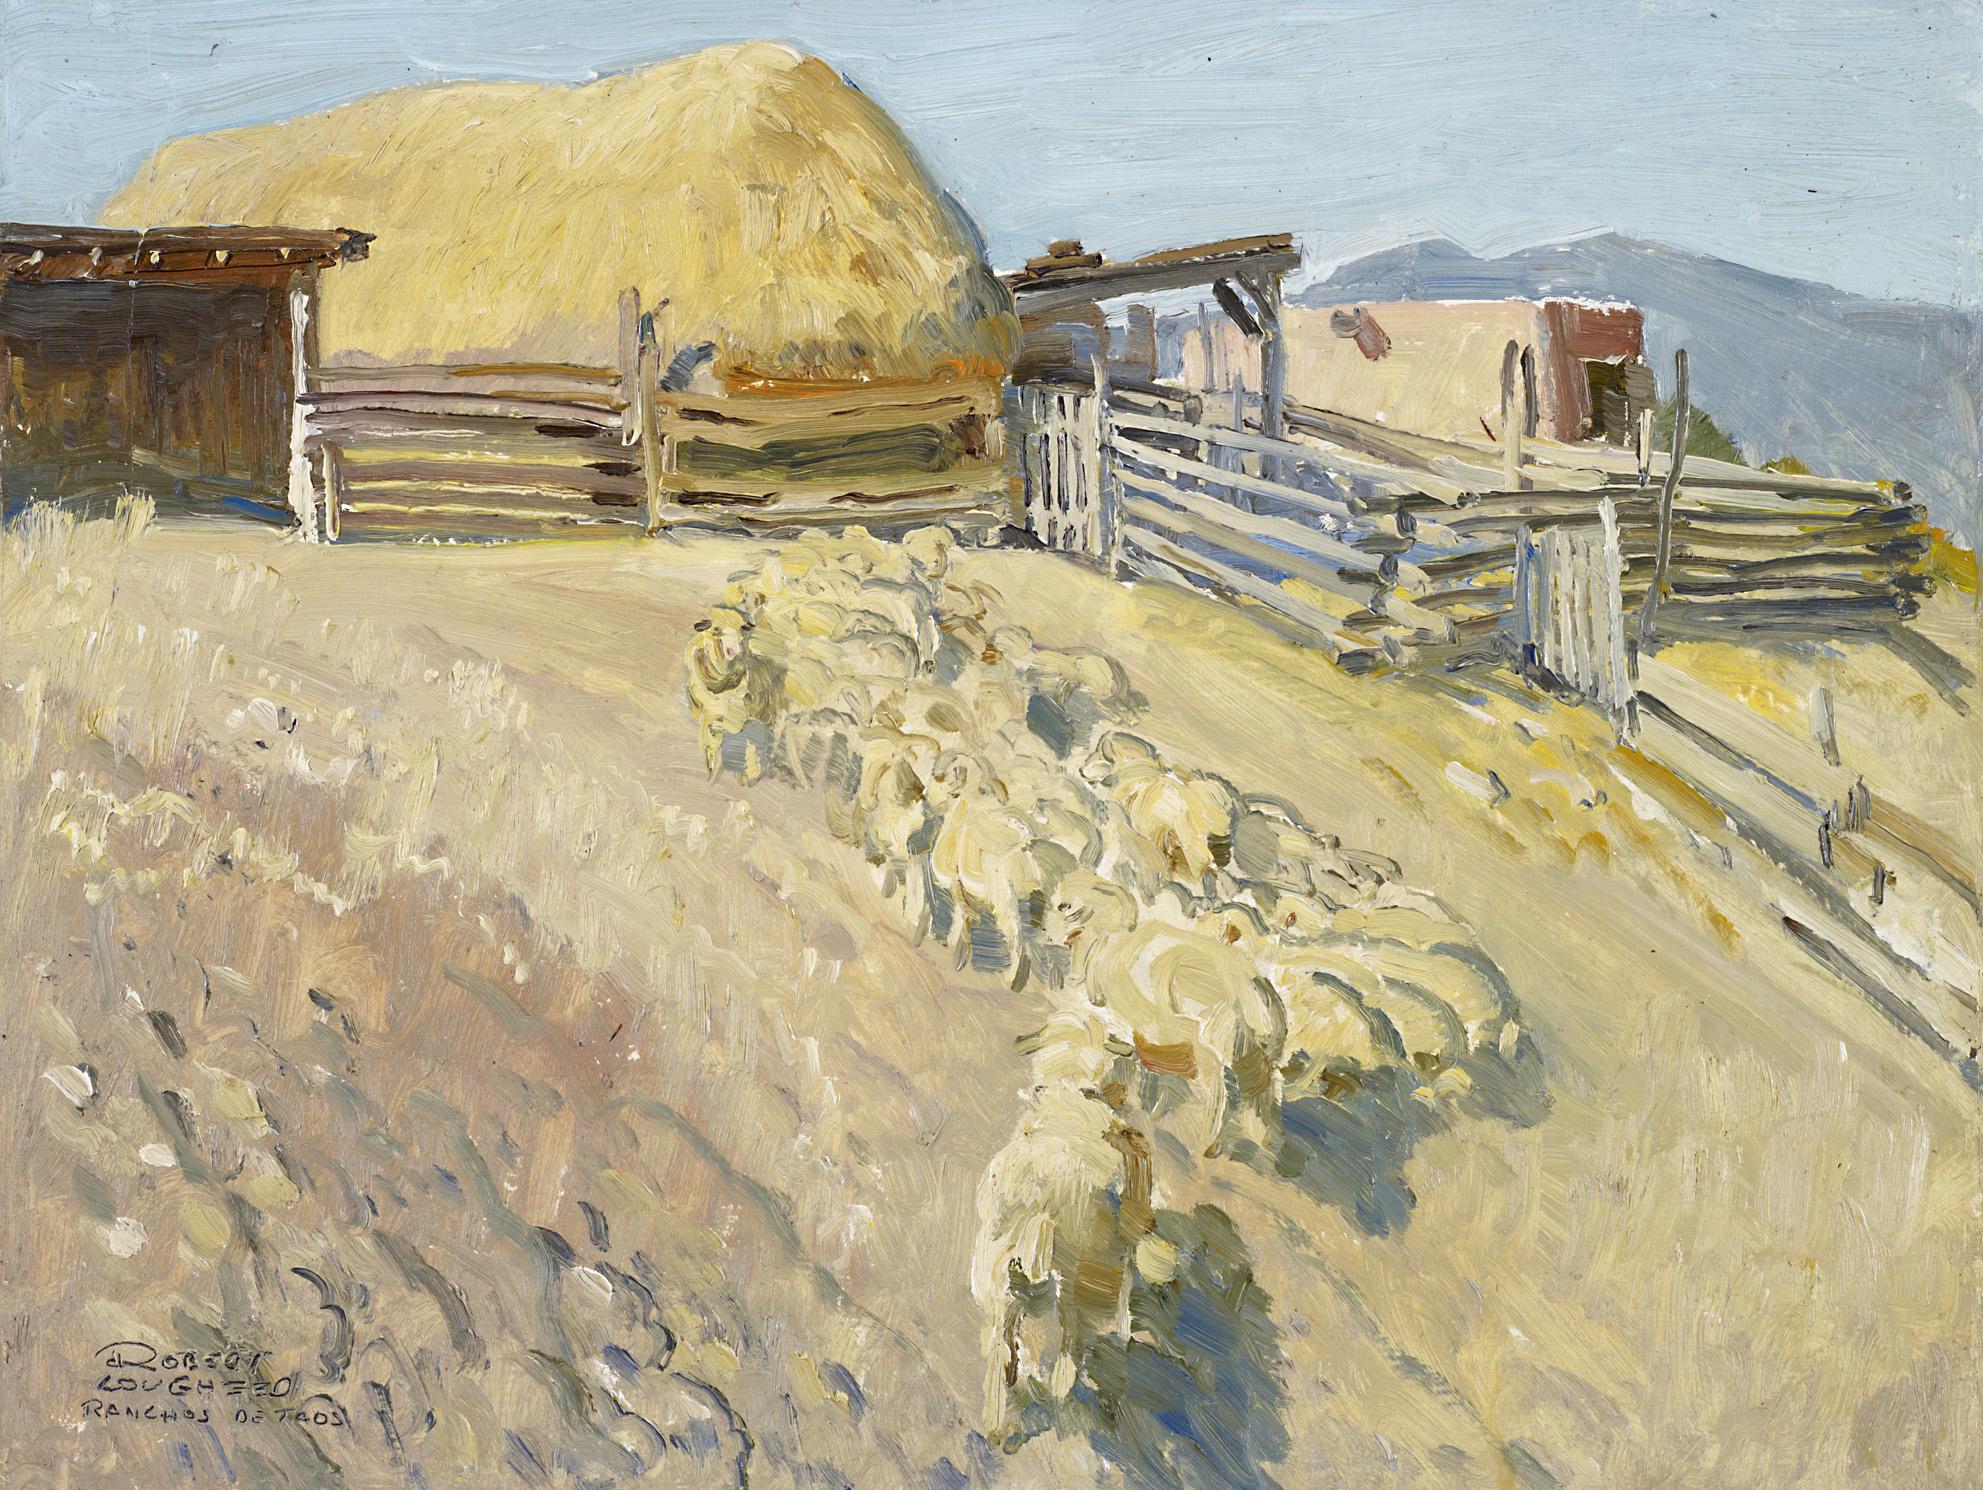 Ranchos De Taos Sheep by  Robert Lougheed - Masterpiece Online